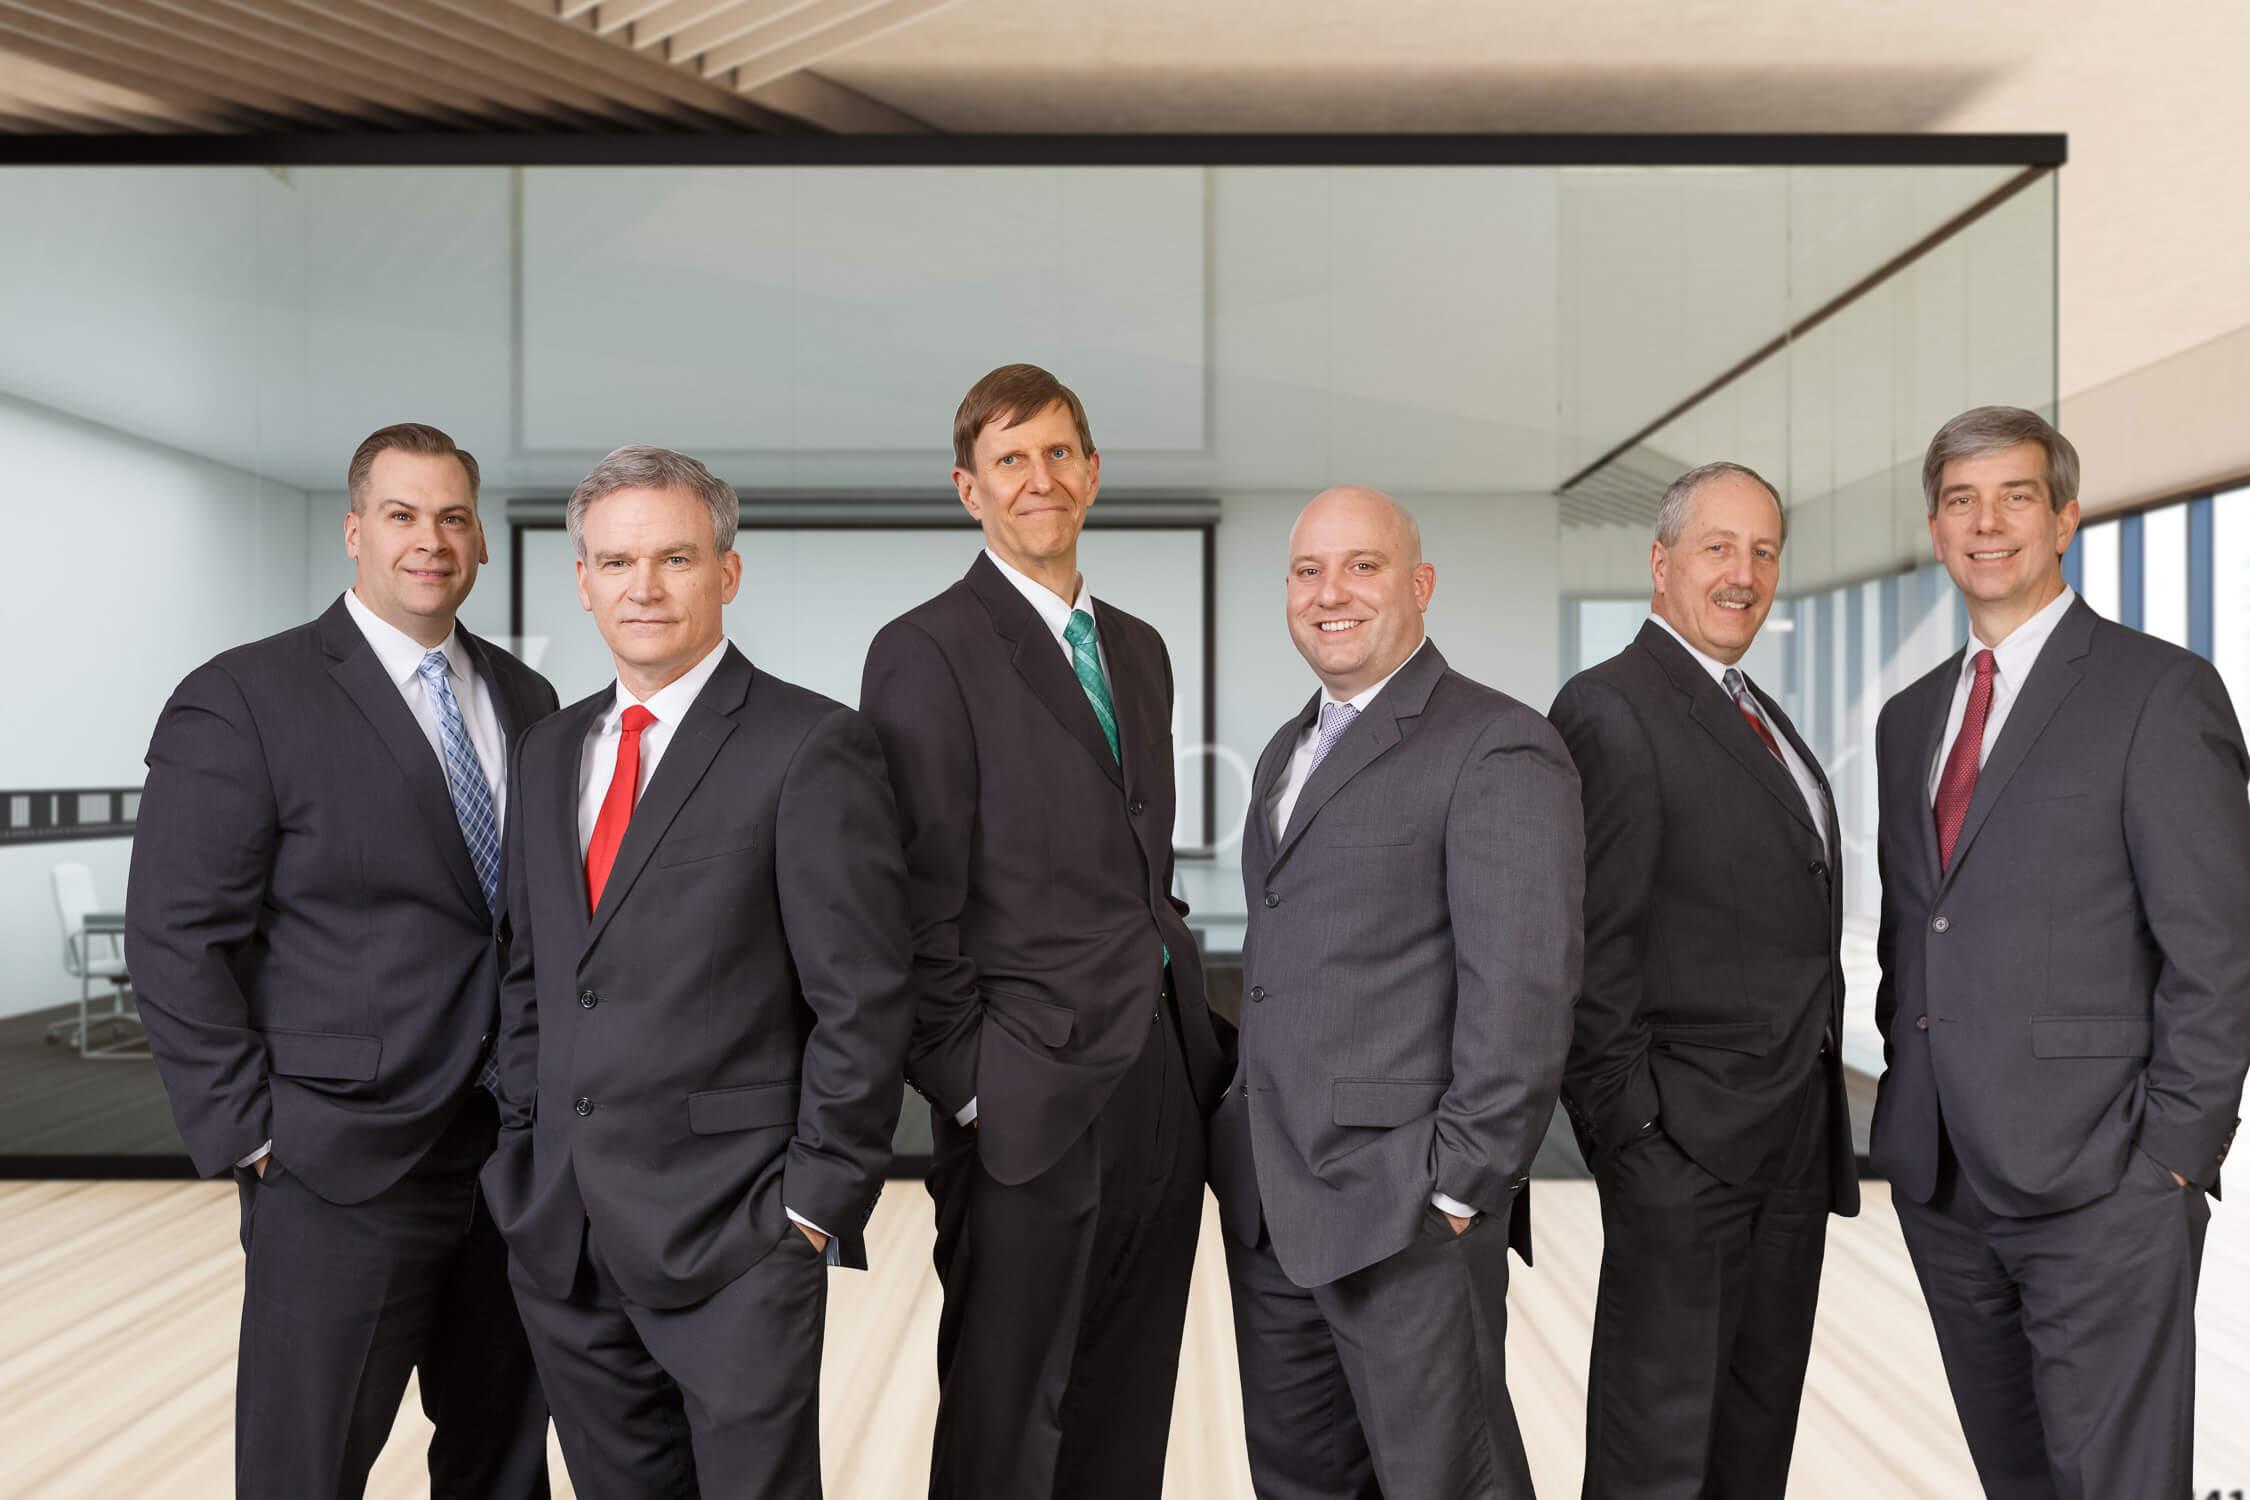 Best New Jersey Corporate Photographer